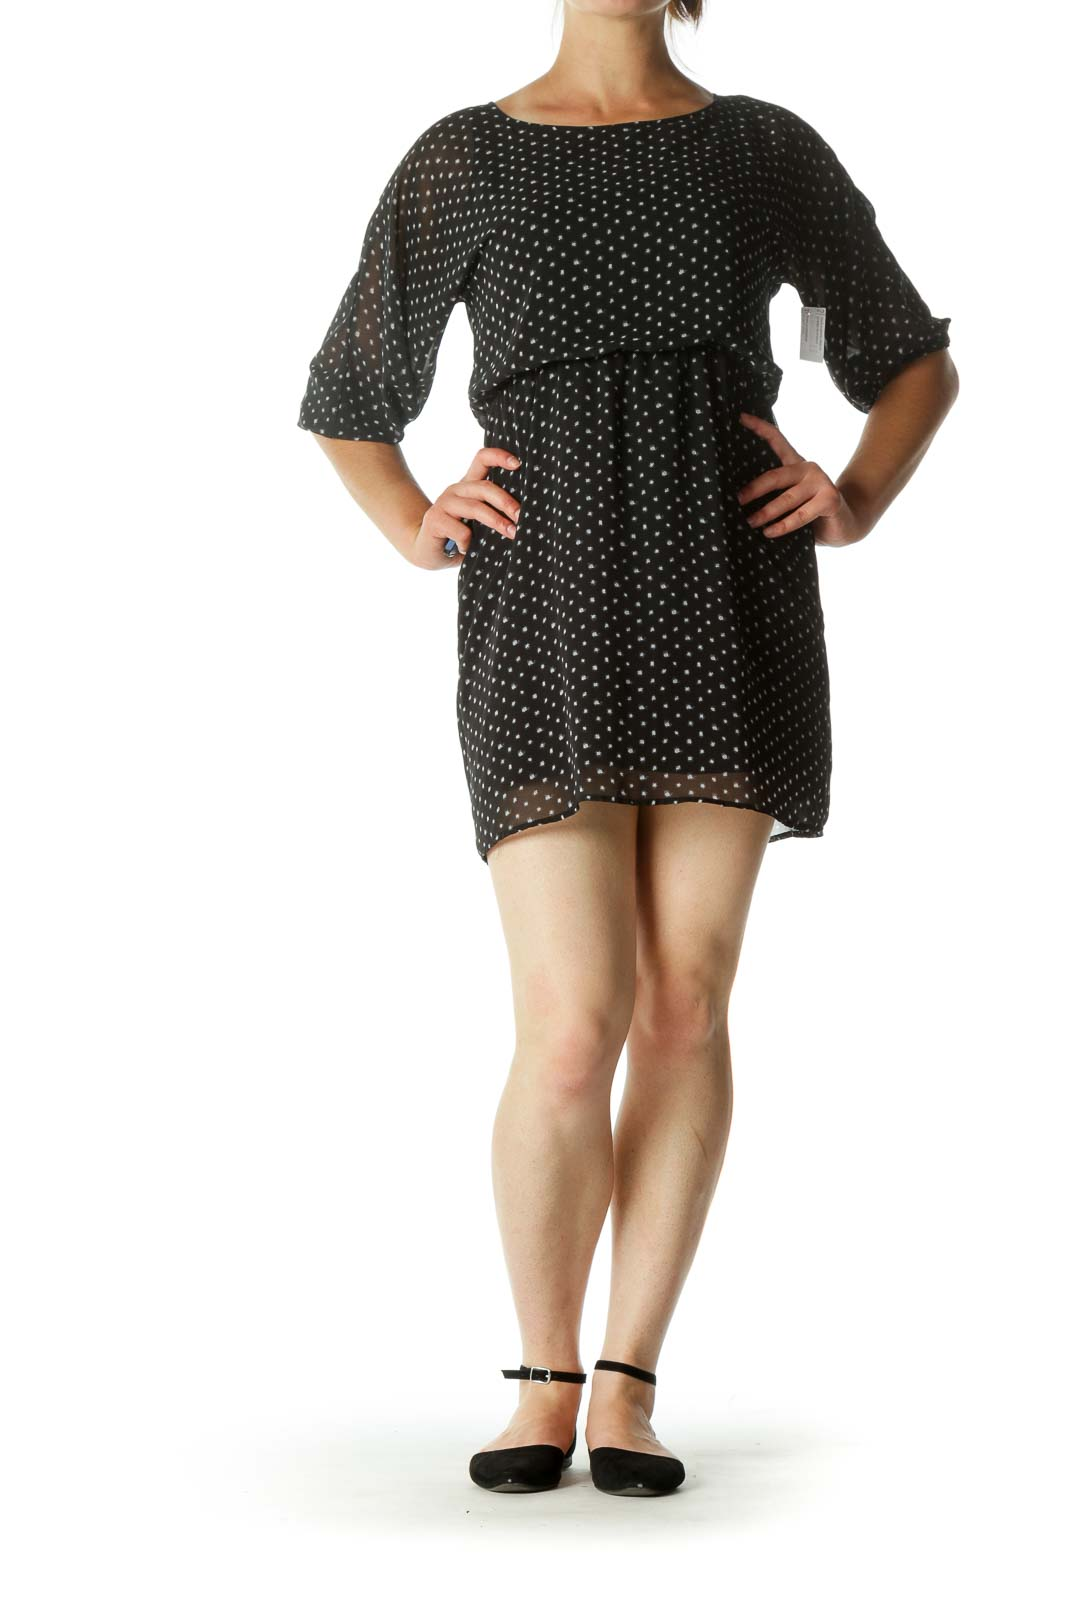 Black and White Polka-Dot Single Button Day Dress